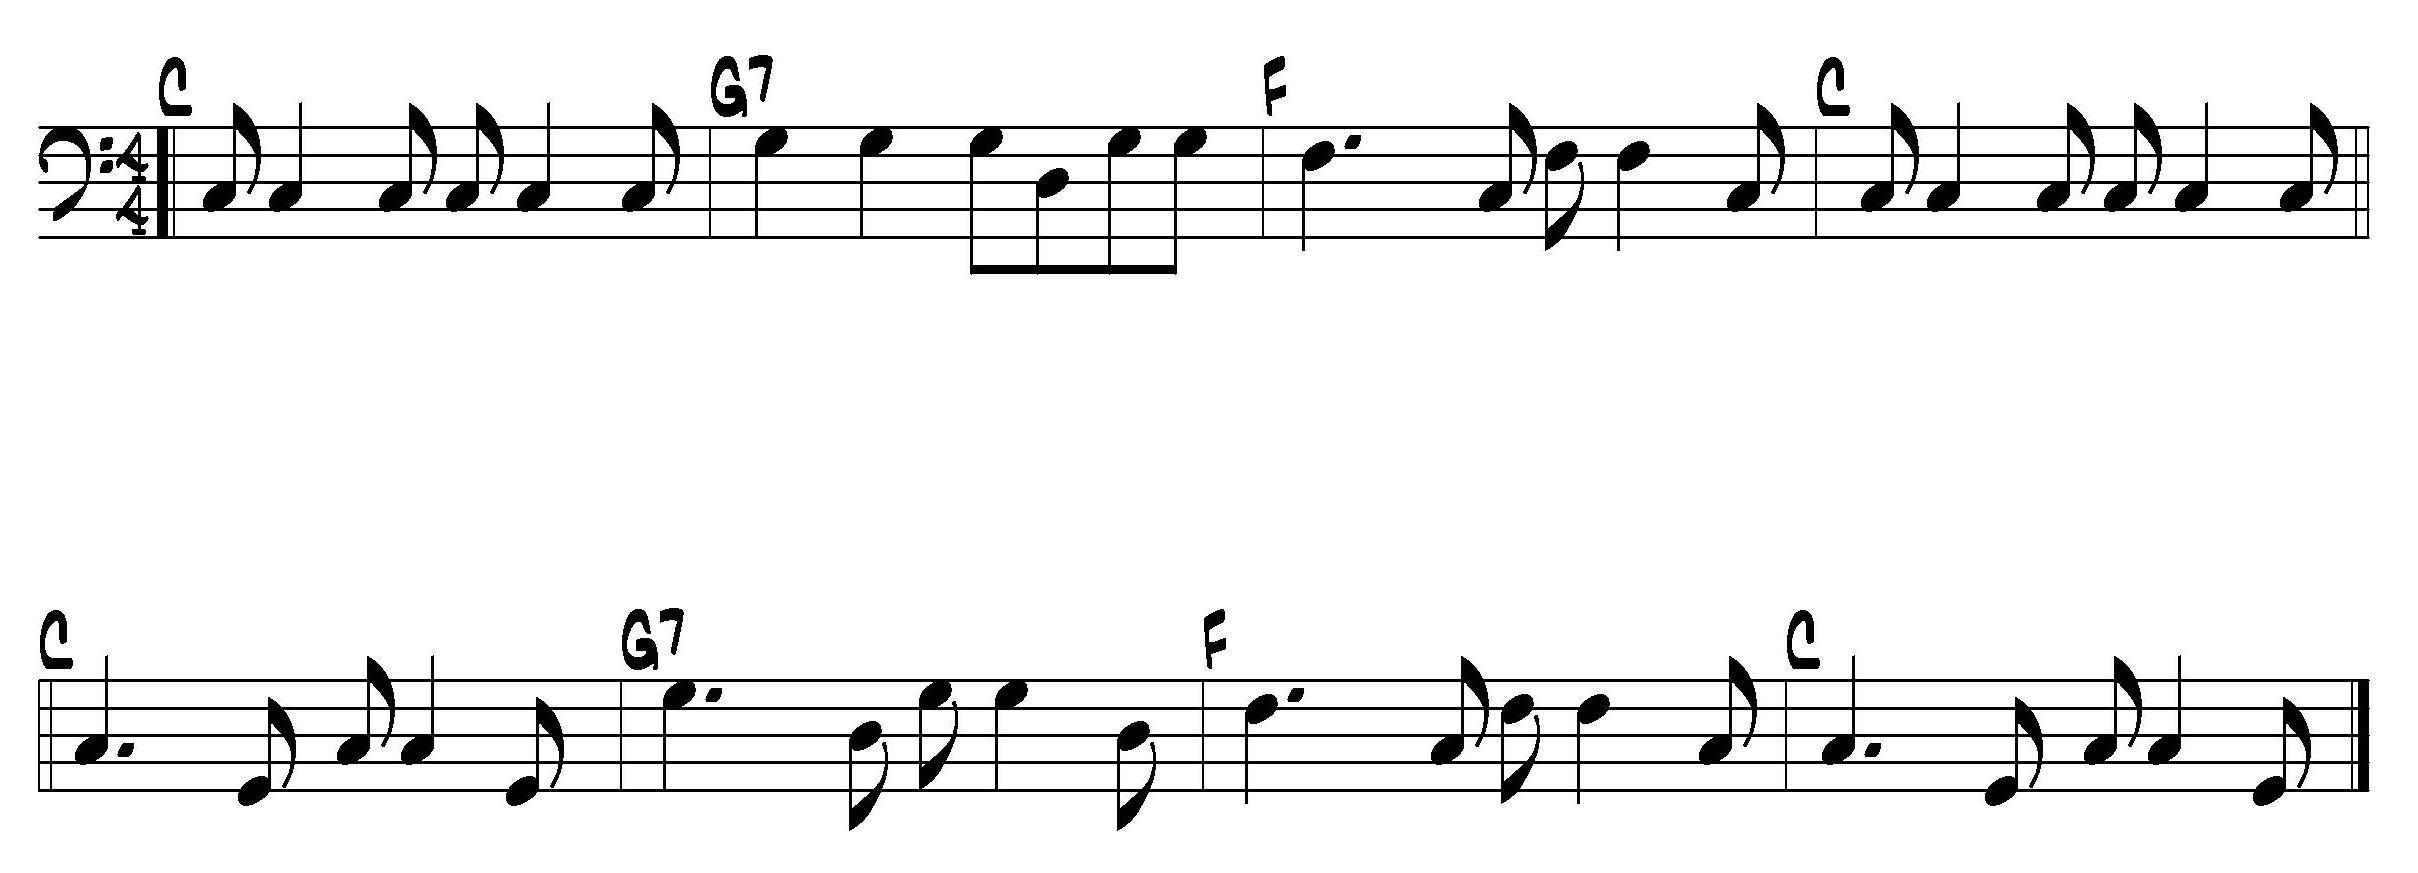 File:Reggae Bass Line.jpg - Wikimedia Commons